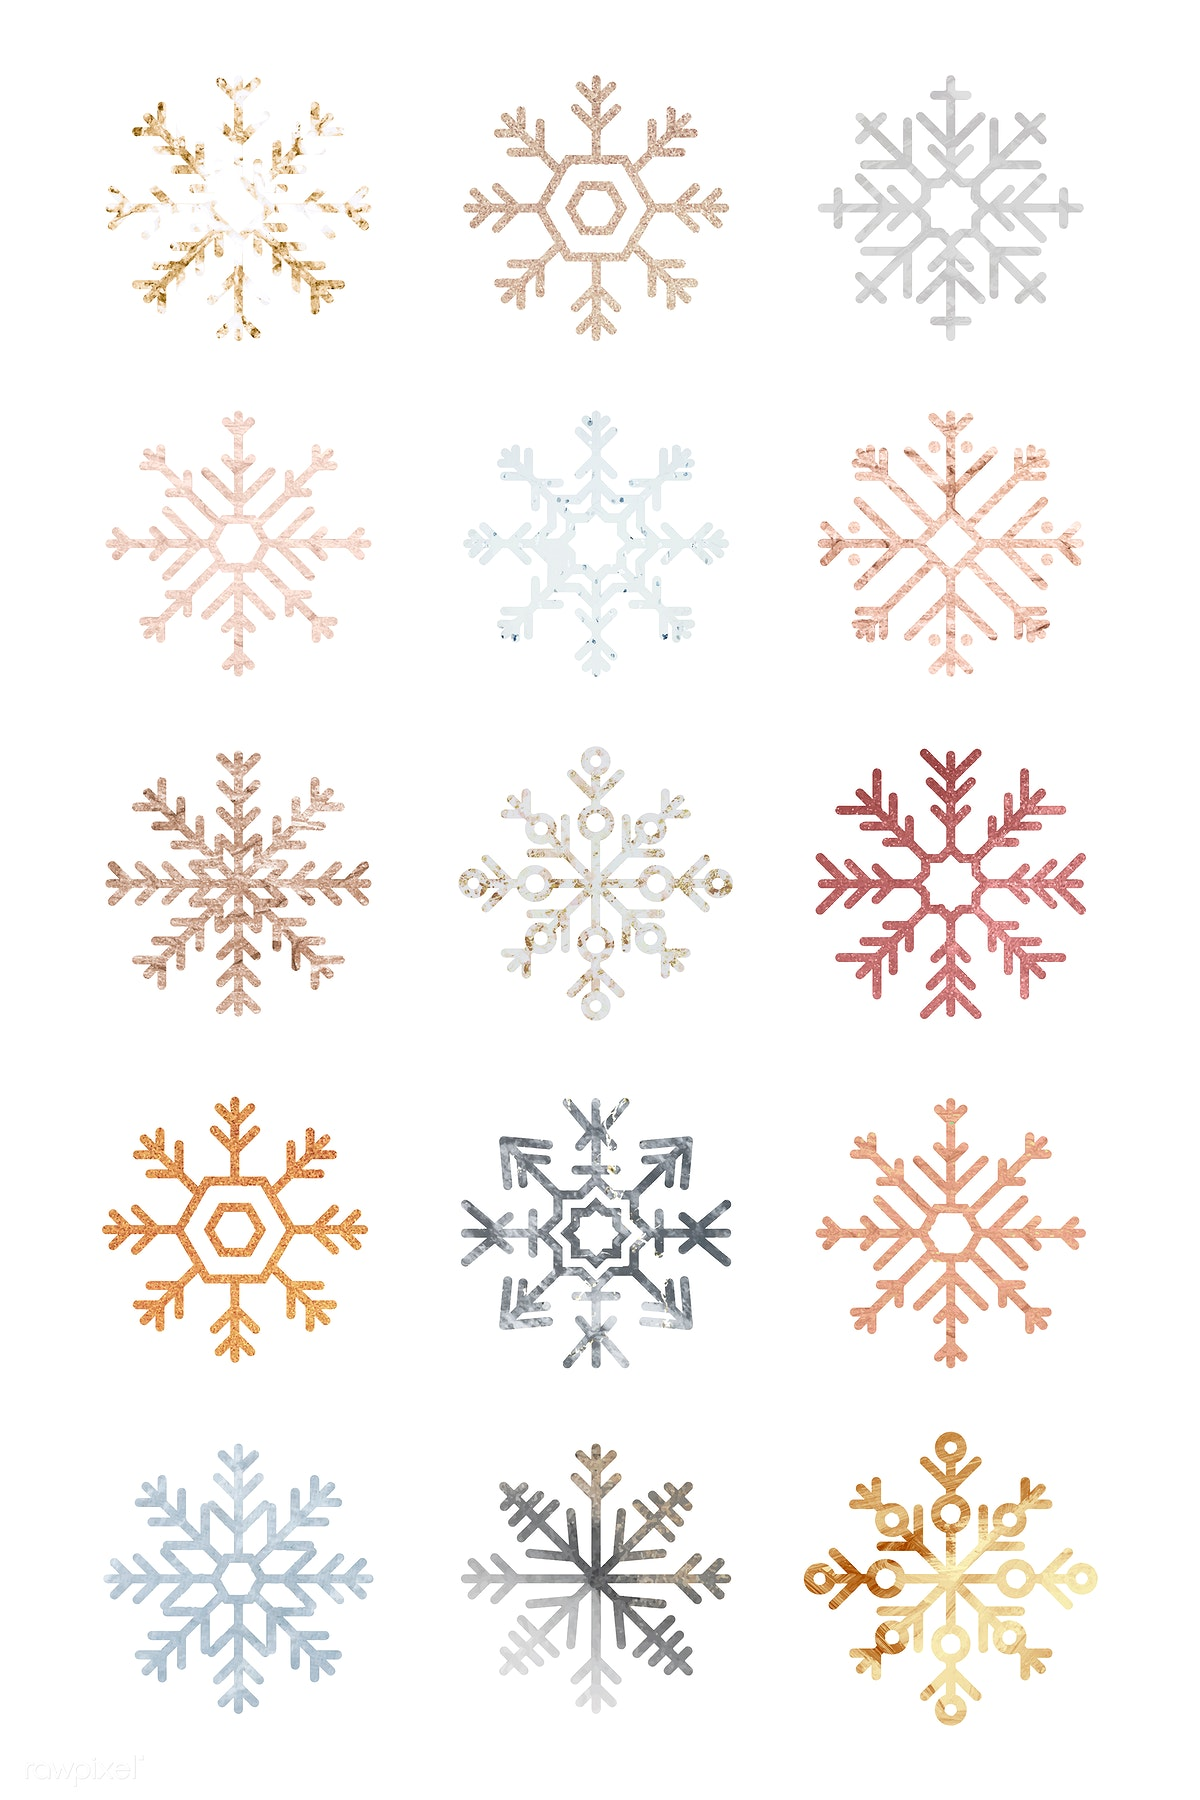 Christmas Snowflakes.Download Premium Image Of Christmas Snowflakes Decorative Ornament